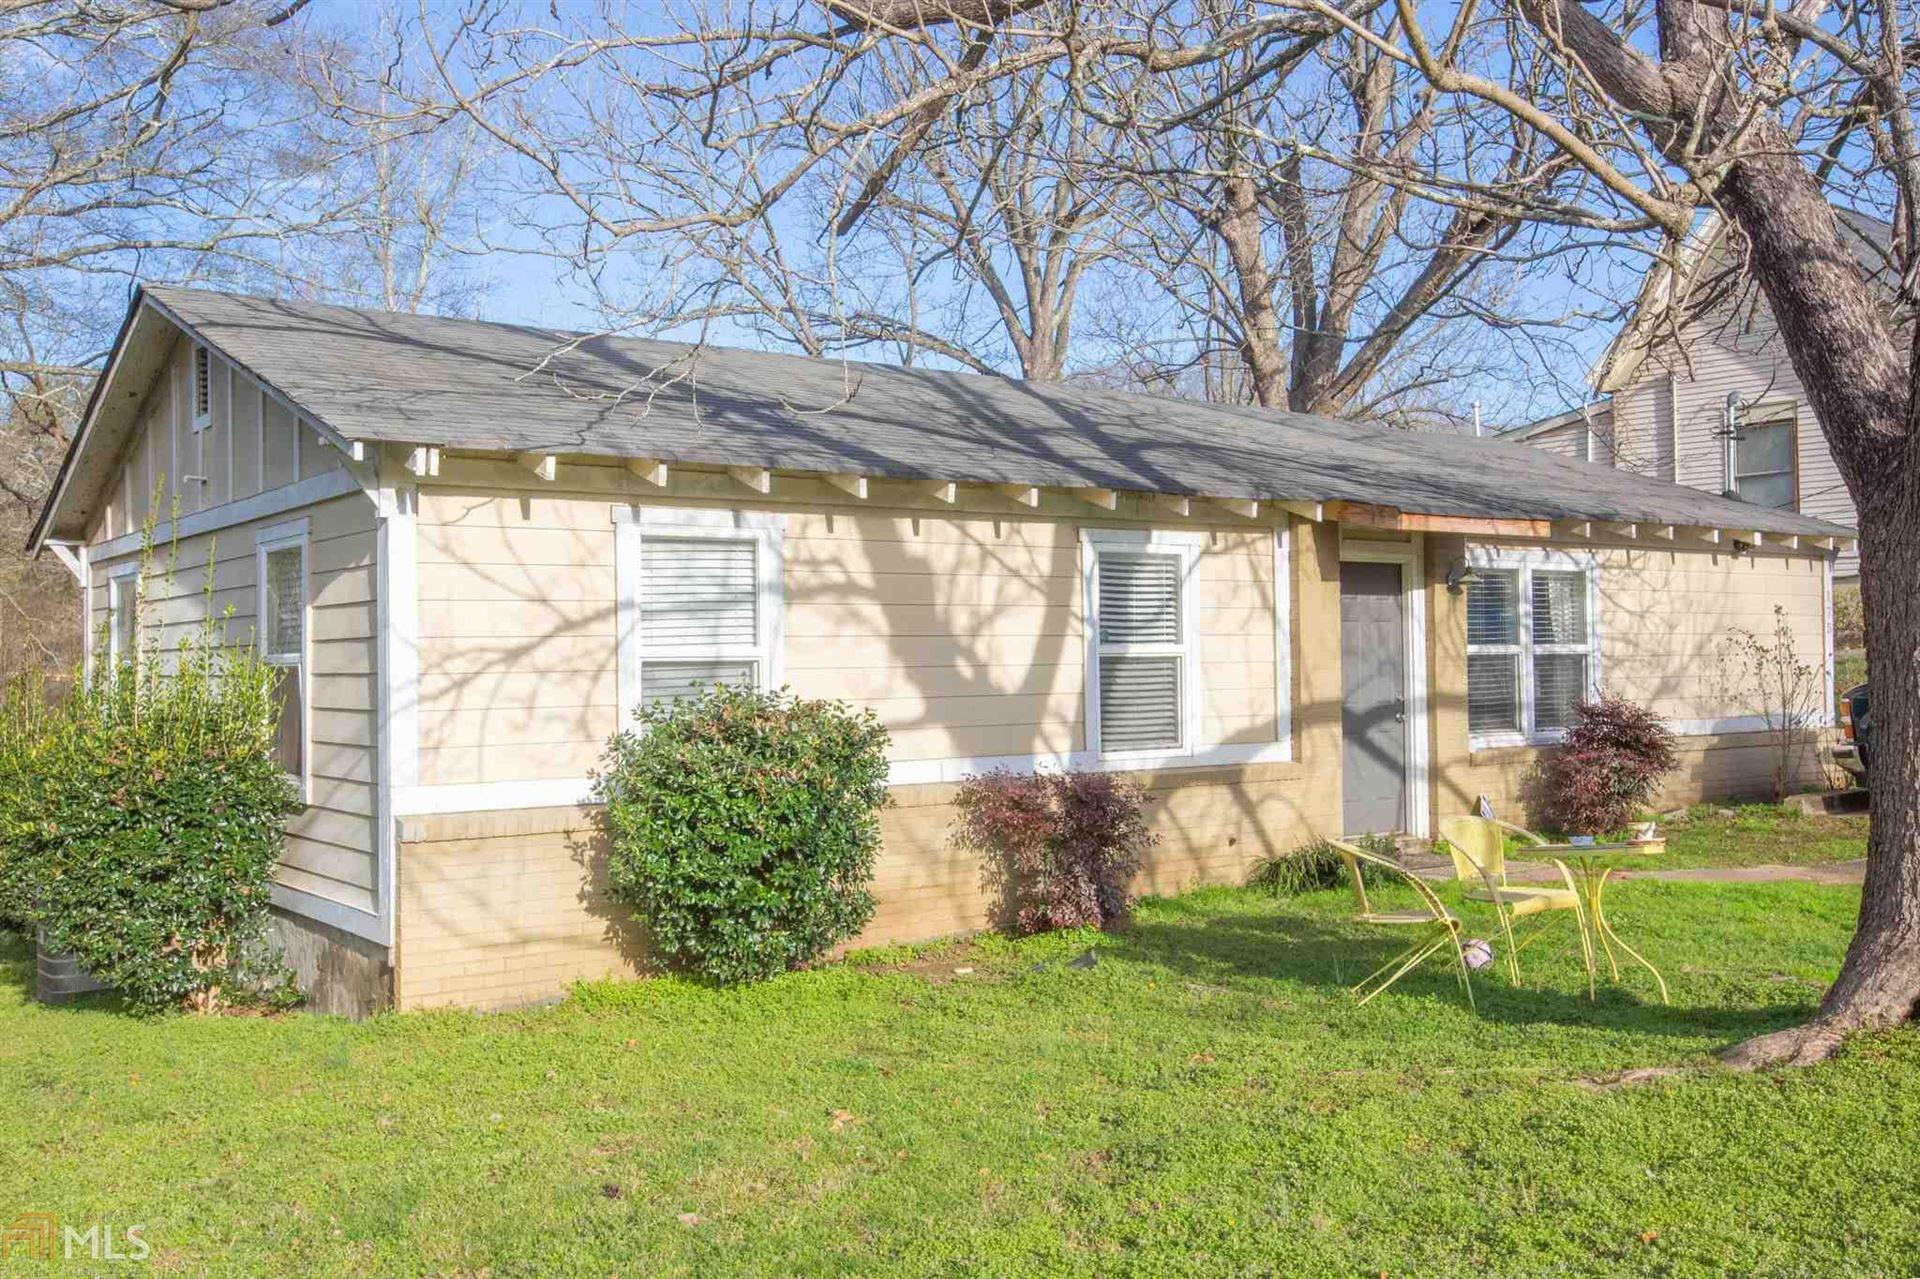 175 Herman, Athens, GA 30601 - MLS#: 8871555